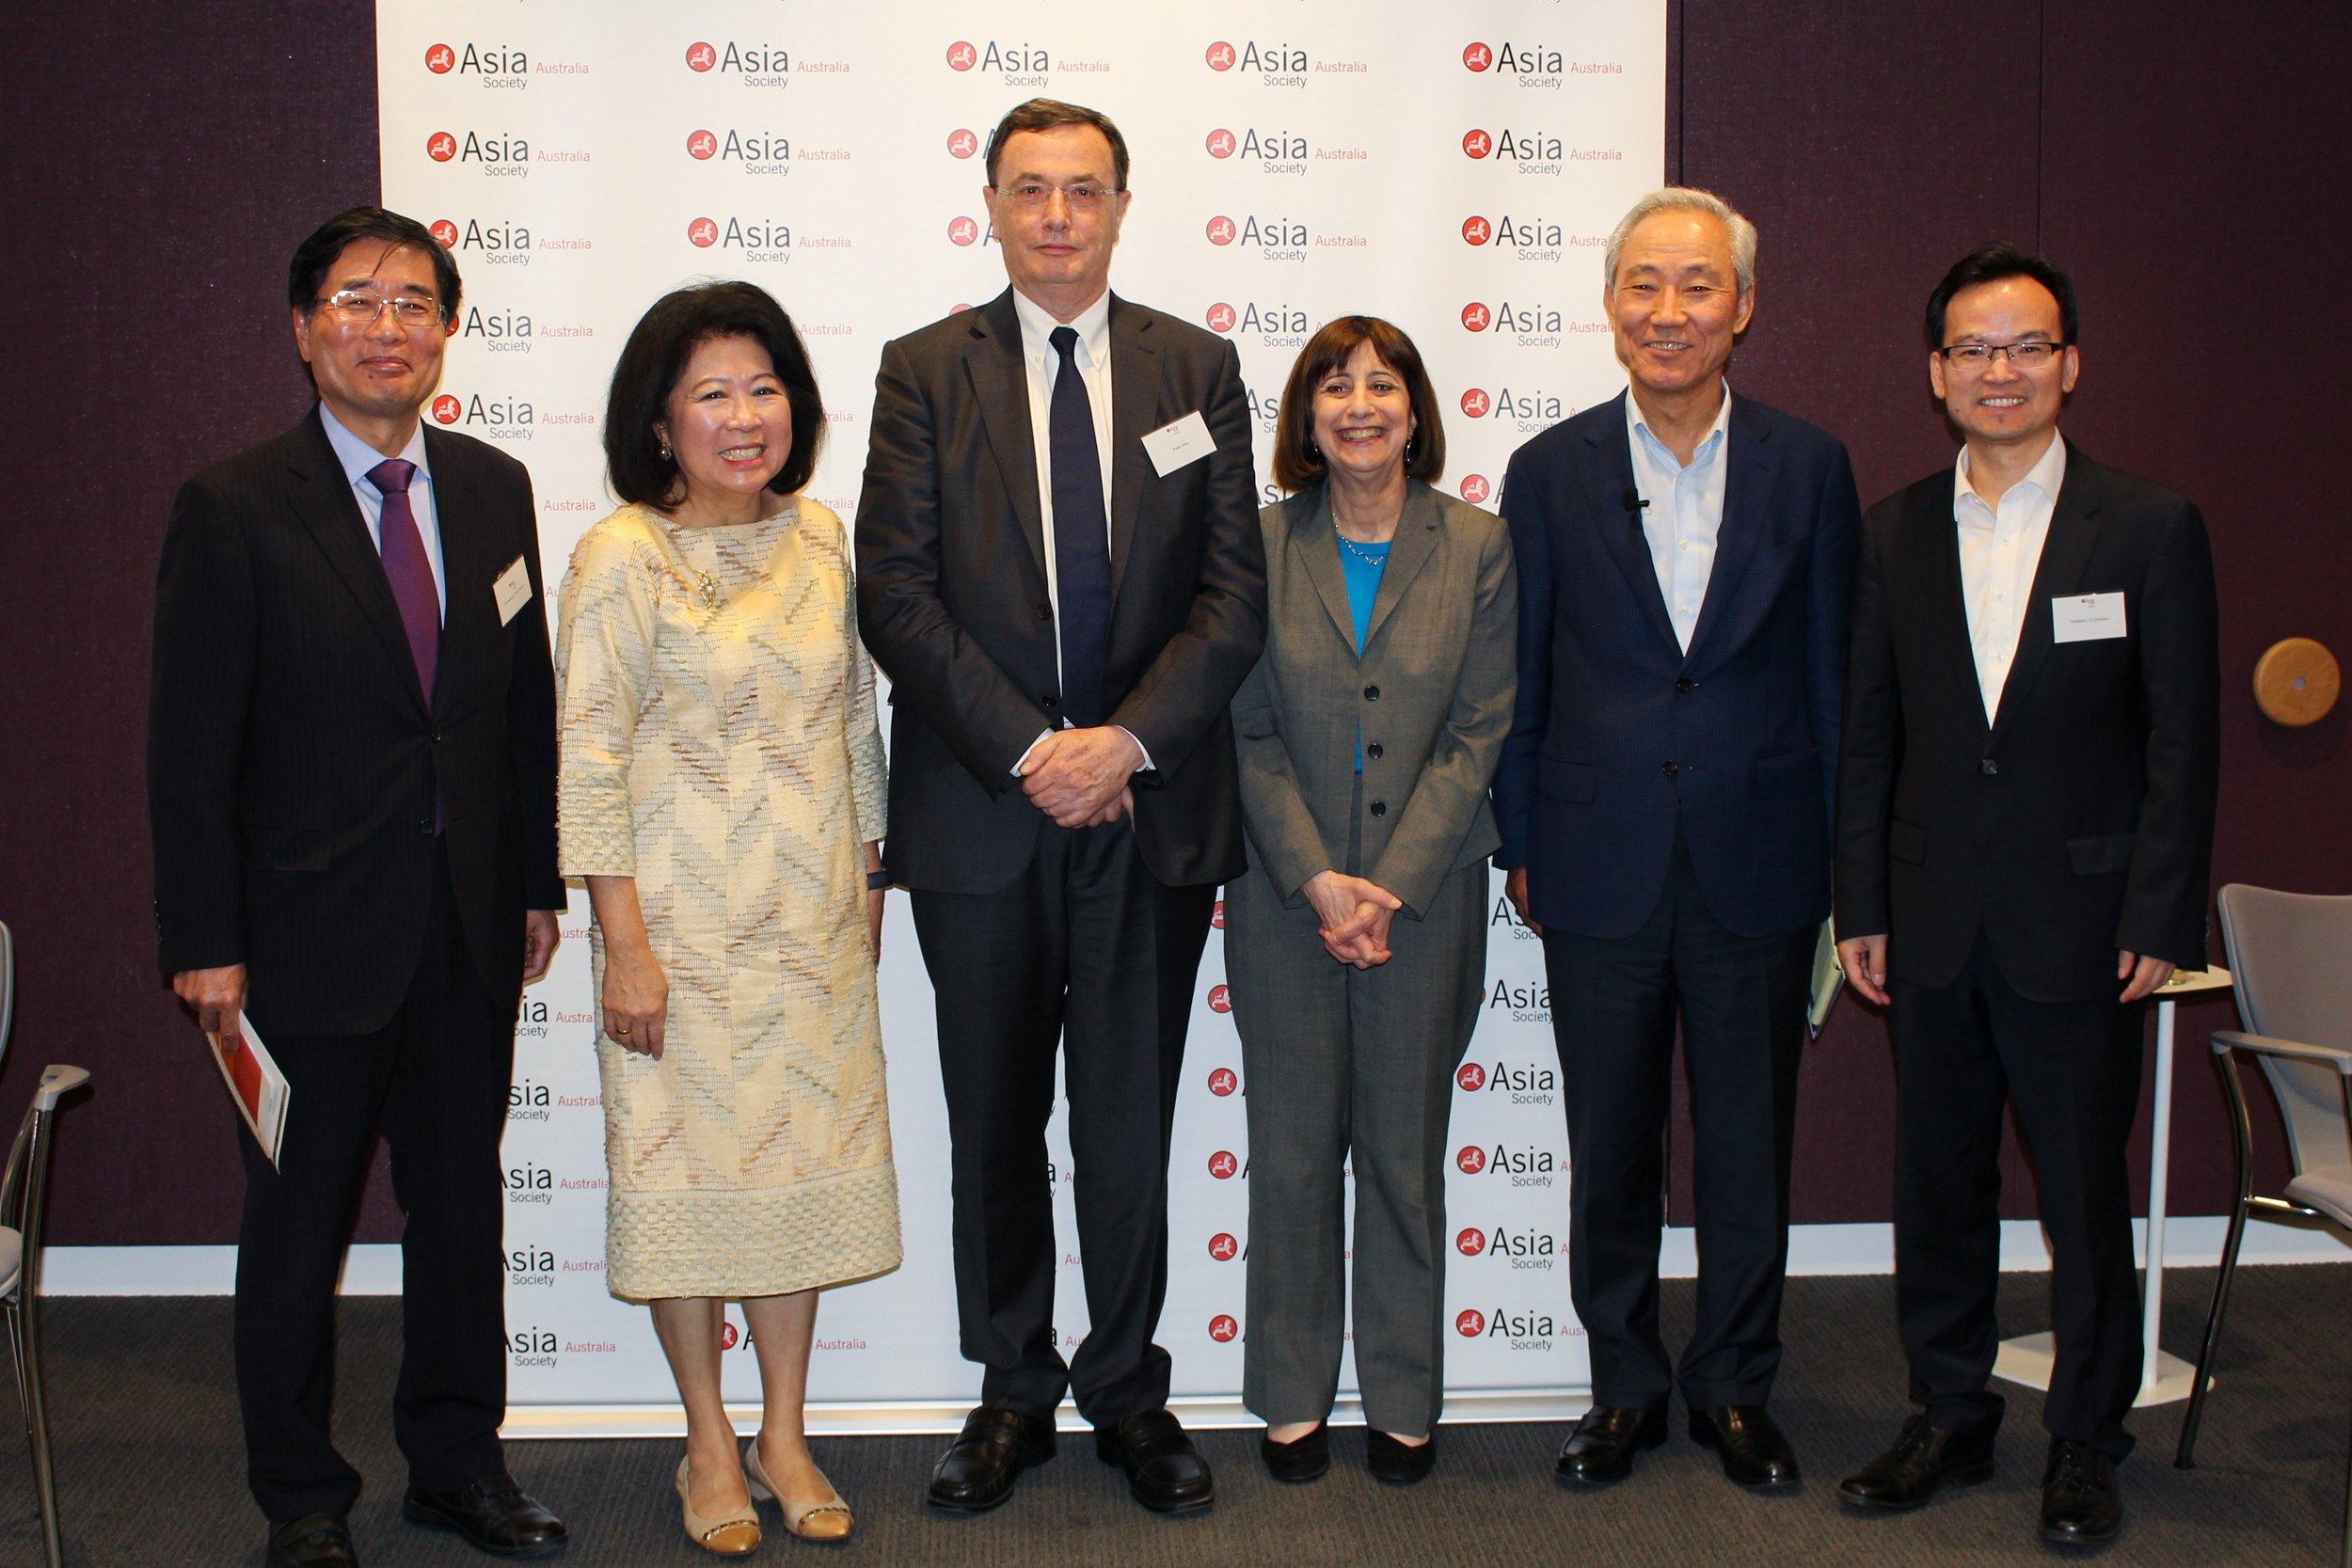 From left: Ambassador Yoichi Suzuki, Dr Mari Pangestu, Peter Grey, Wendy Cutler (Chair), Kim Jong-Hoon, Professor Tu Xinquan during their week-long visit to Australia. (Source: Asia Society Policy Institute)